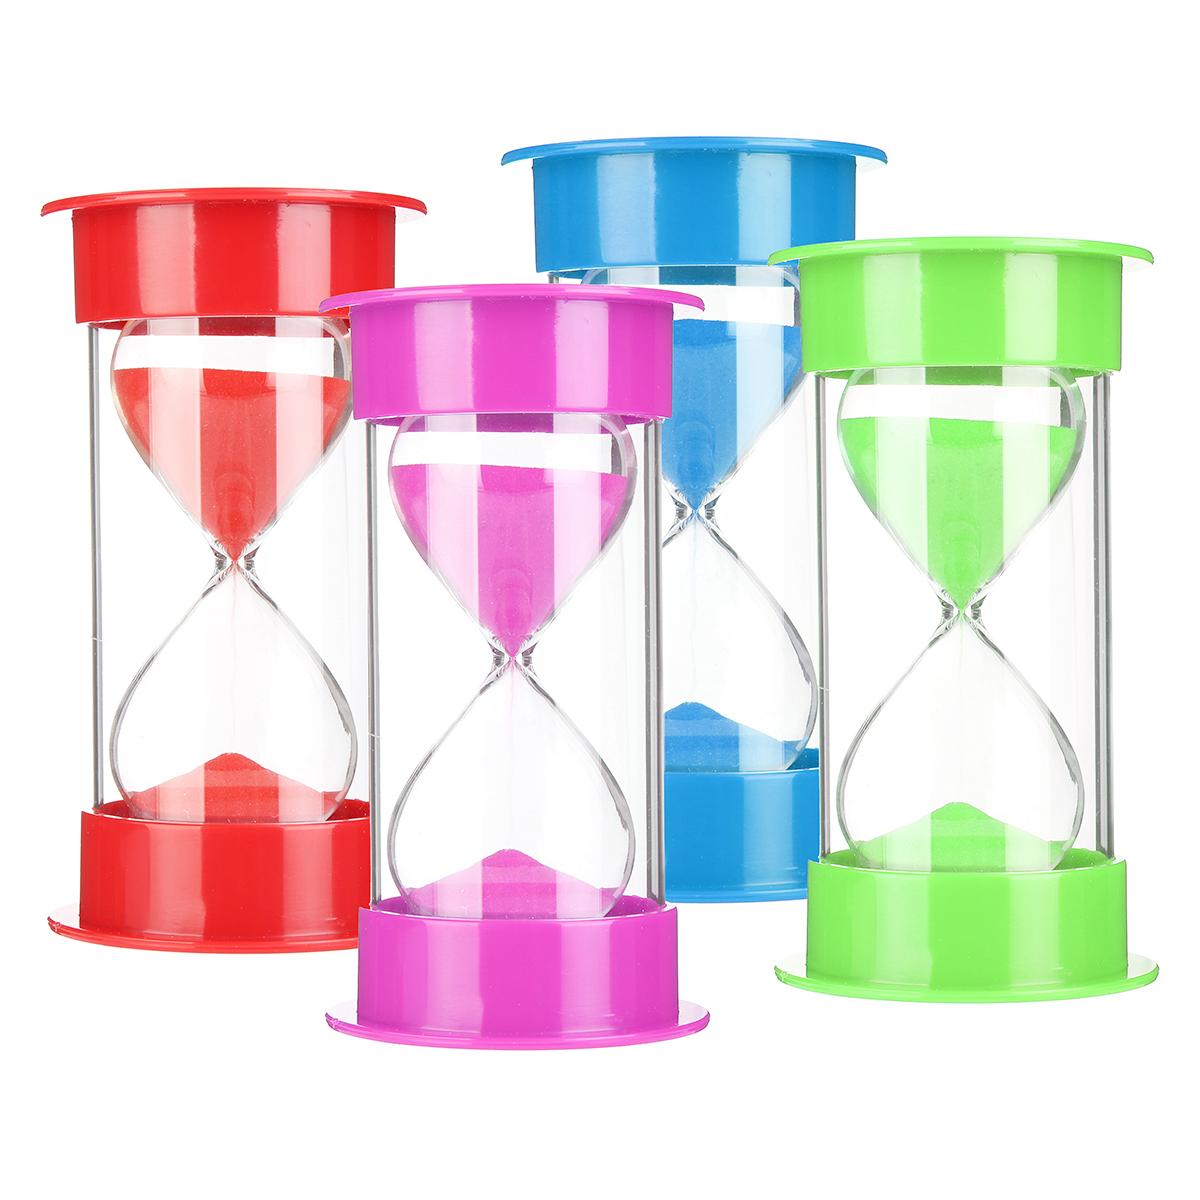 30min minutes sand glass sandglass hourglass timer clock home decor